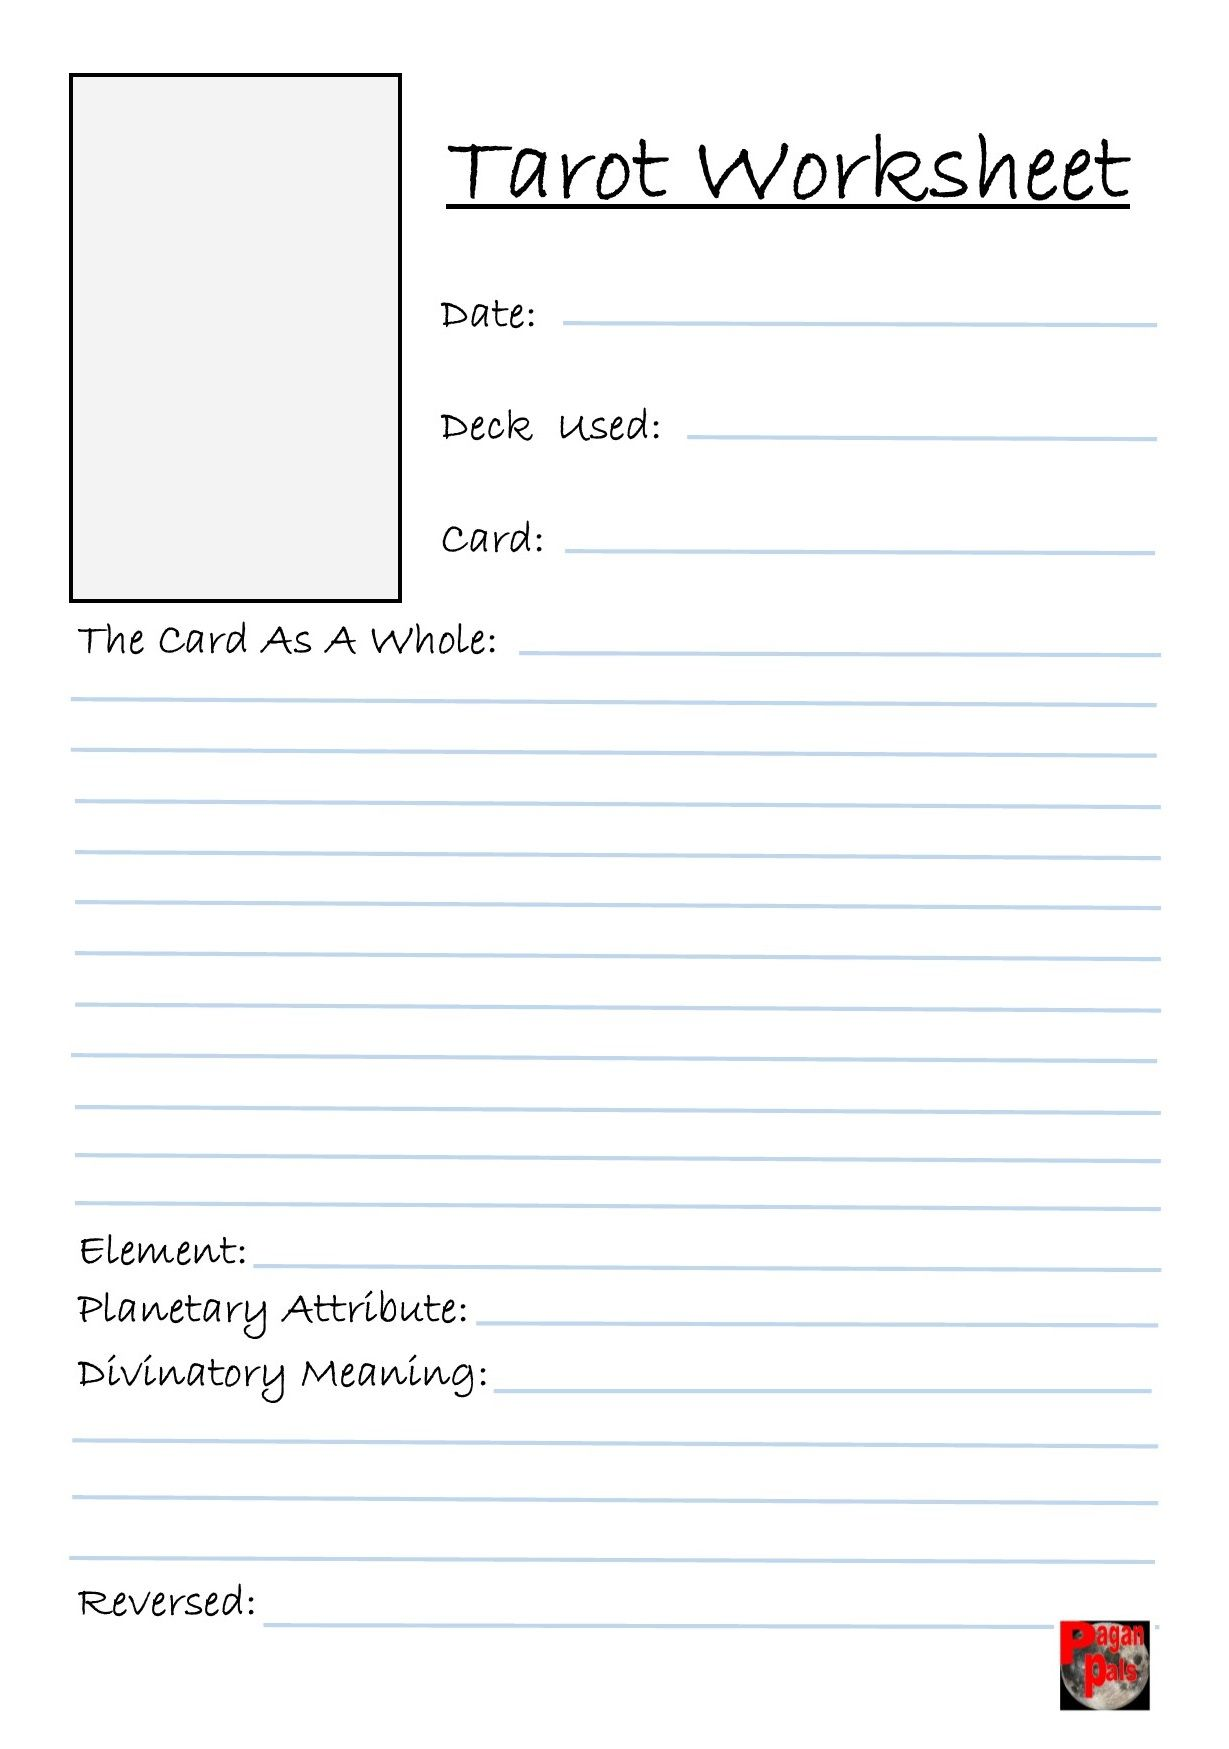 Intrepid image with free printable tarot journal